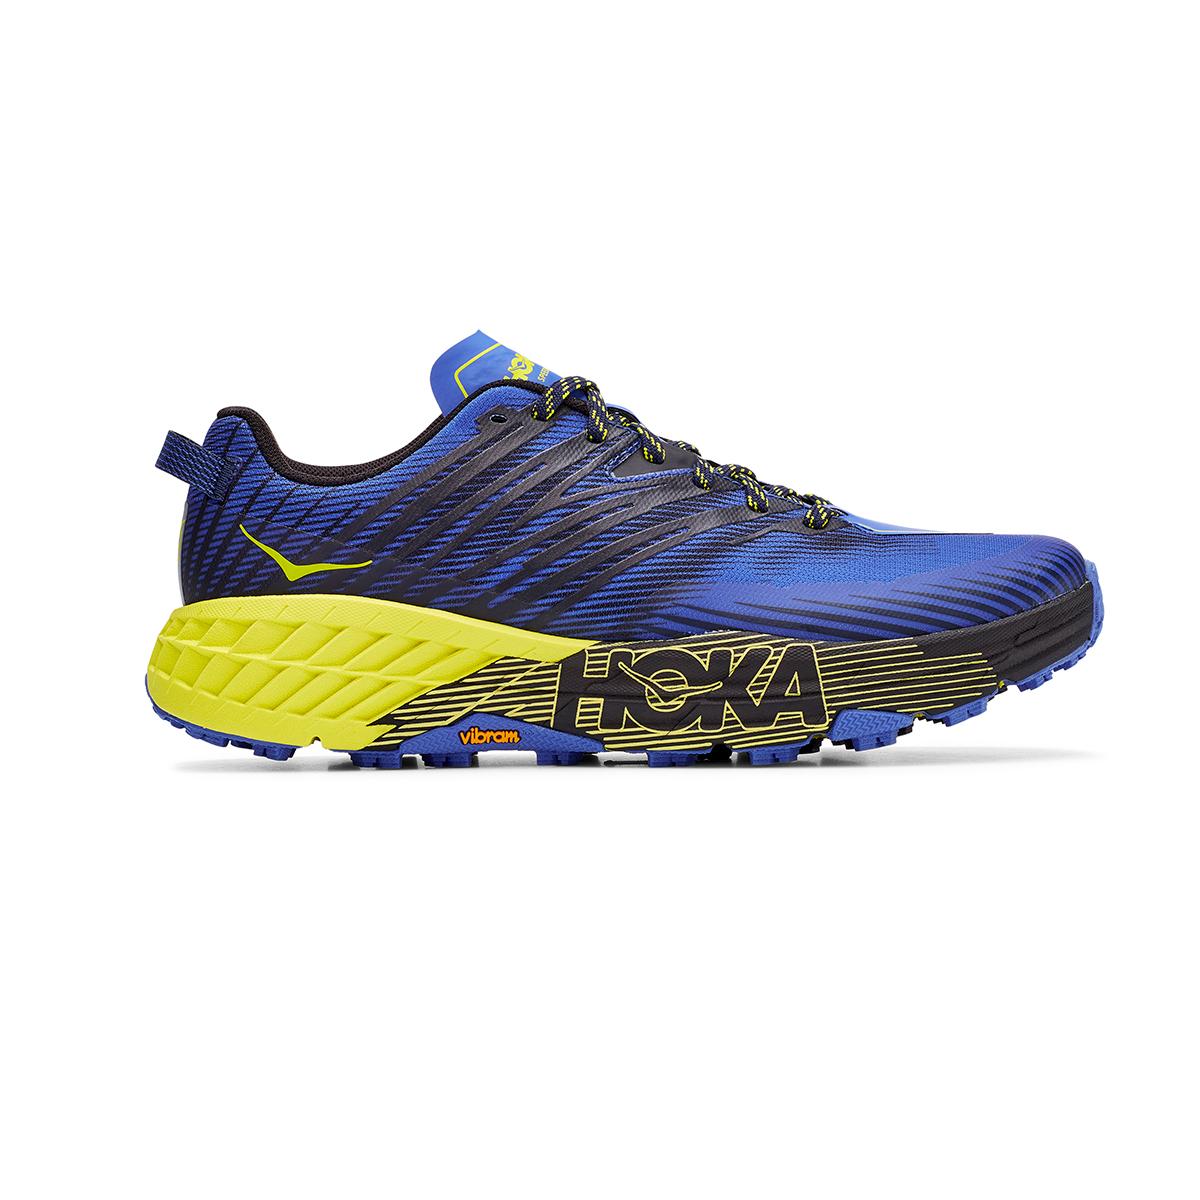 Men's Hoka One One Speedgoat 4 Trail Running Shoe - Color: Black Iris/Evening Primrose - Size: 7 - Width: Regular, Black Iris/Evening Primrose, large, image 1